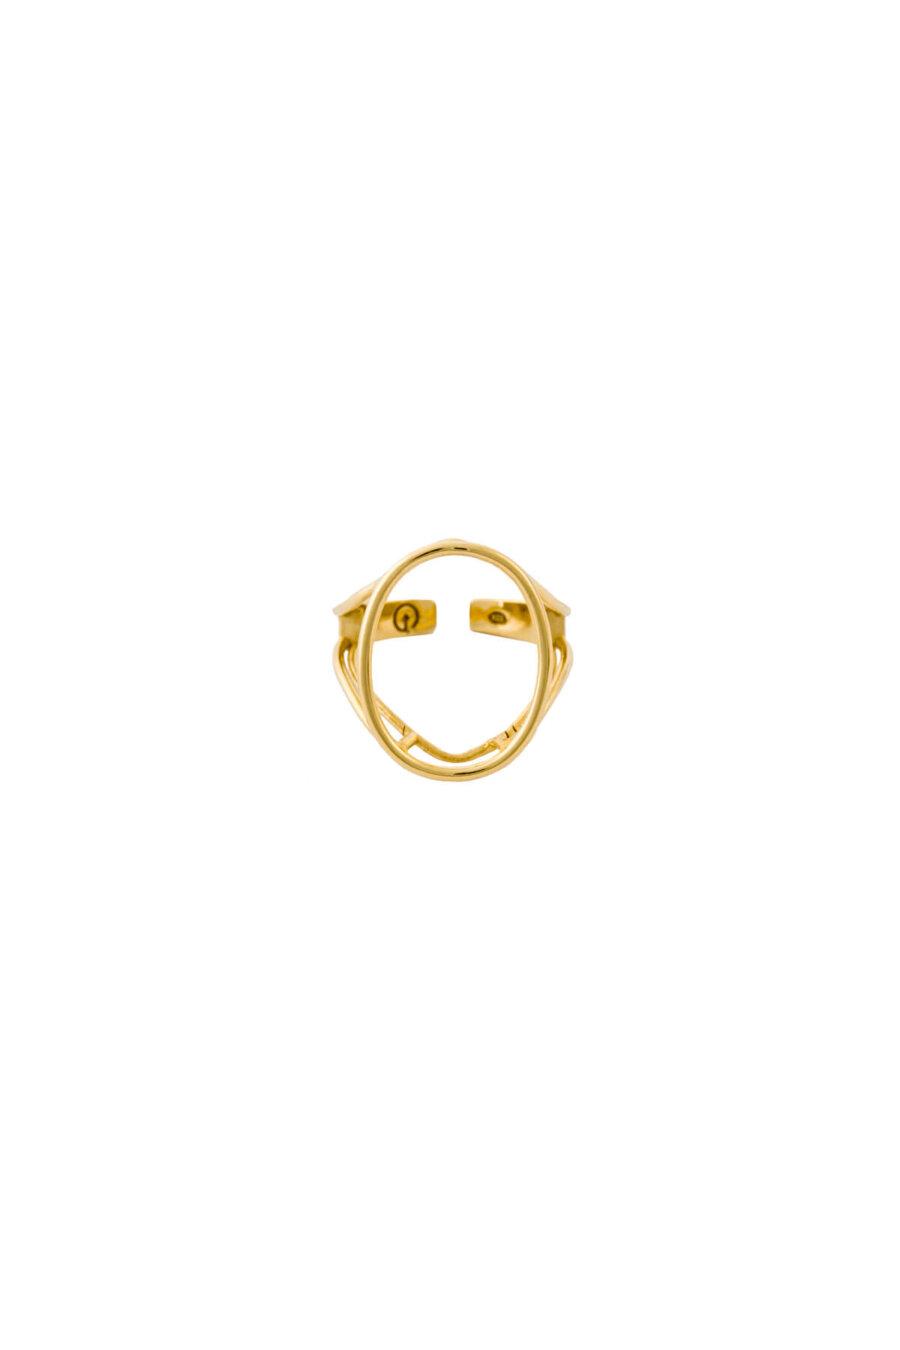 The-empty-signet-ring-by-glenda-lopez-frontal